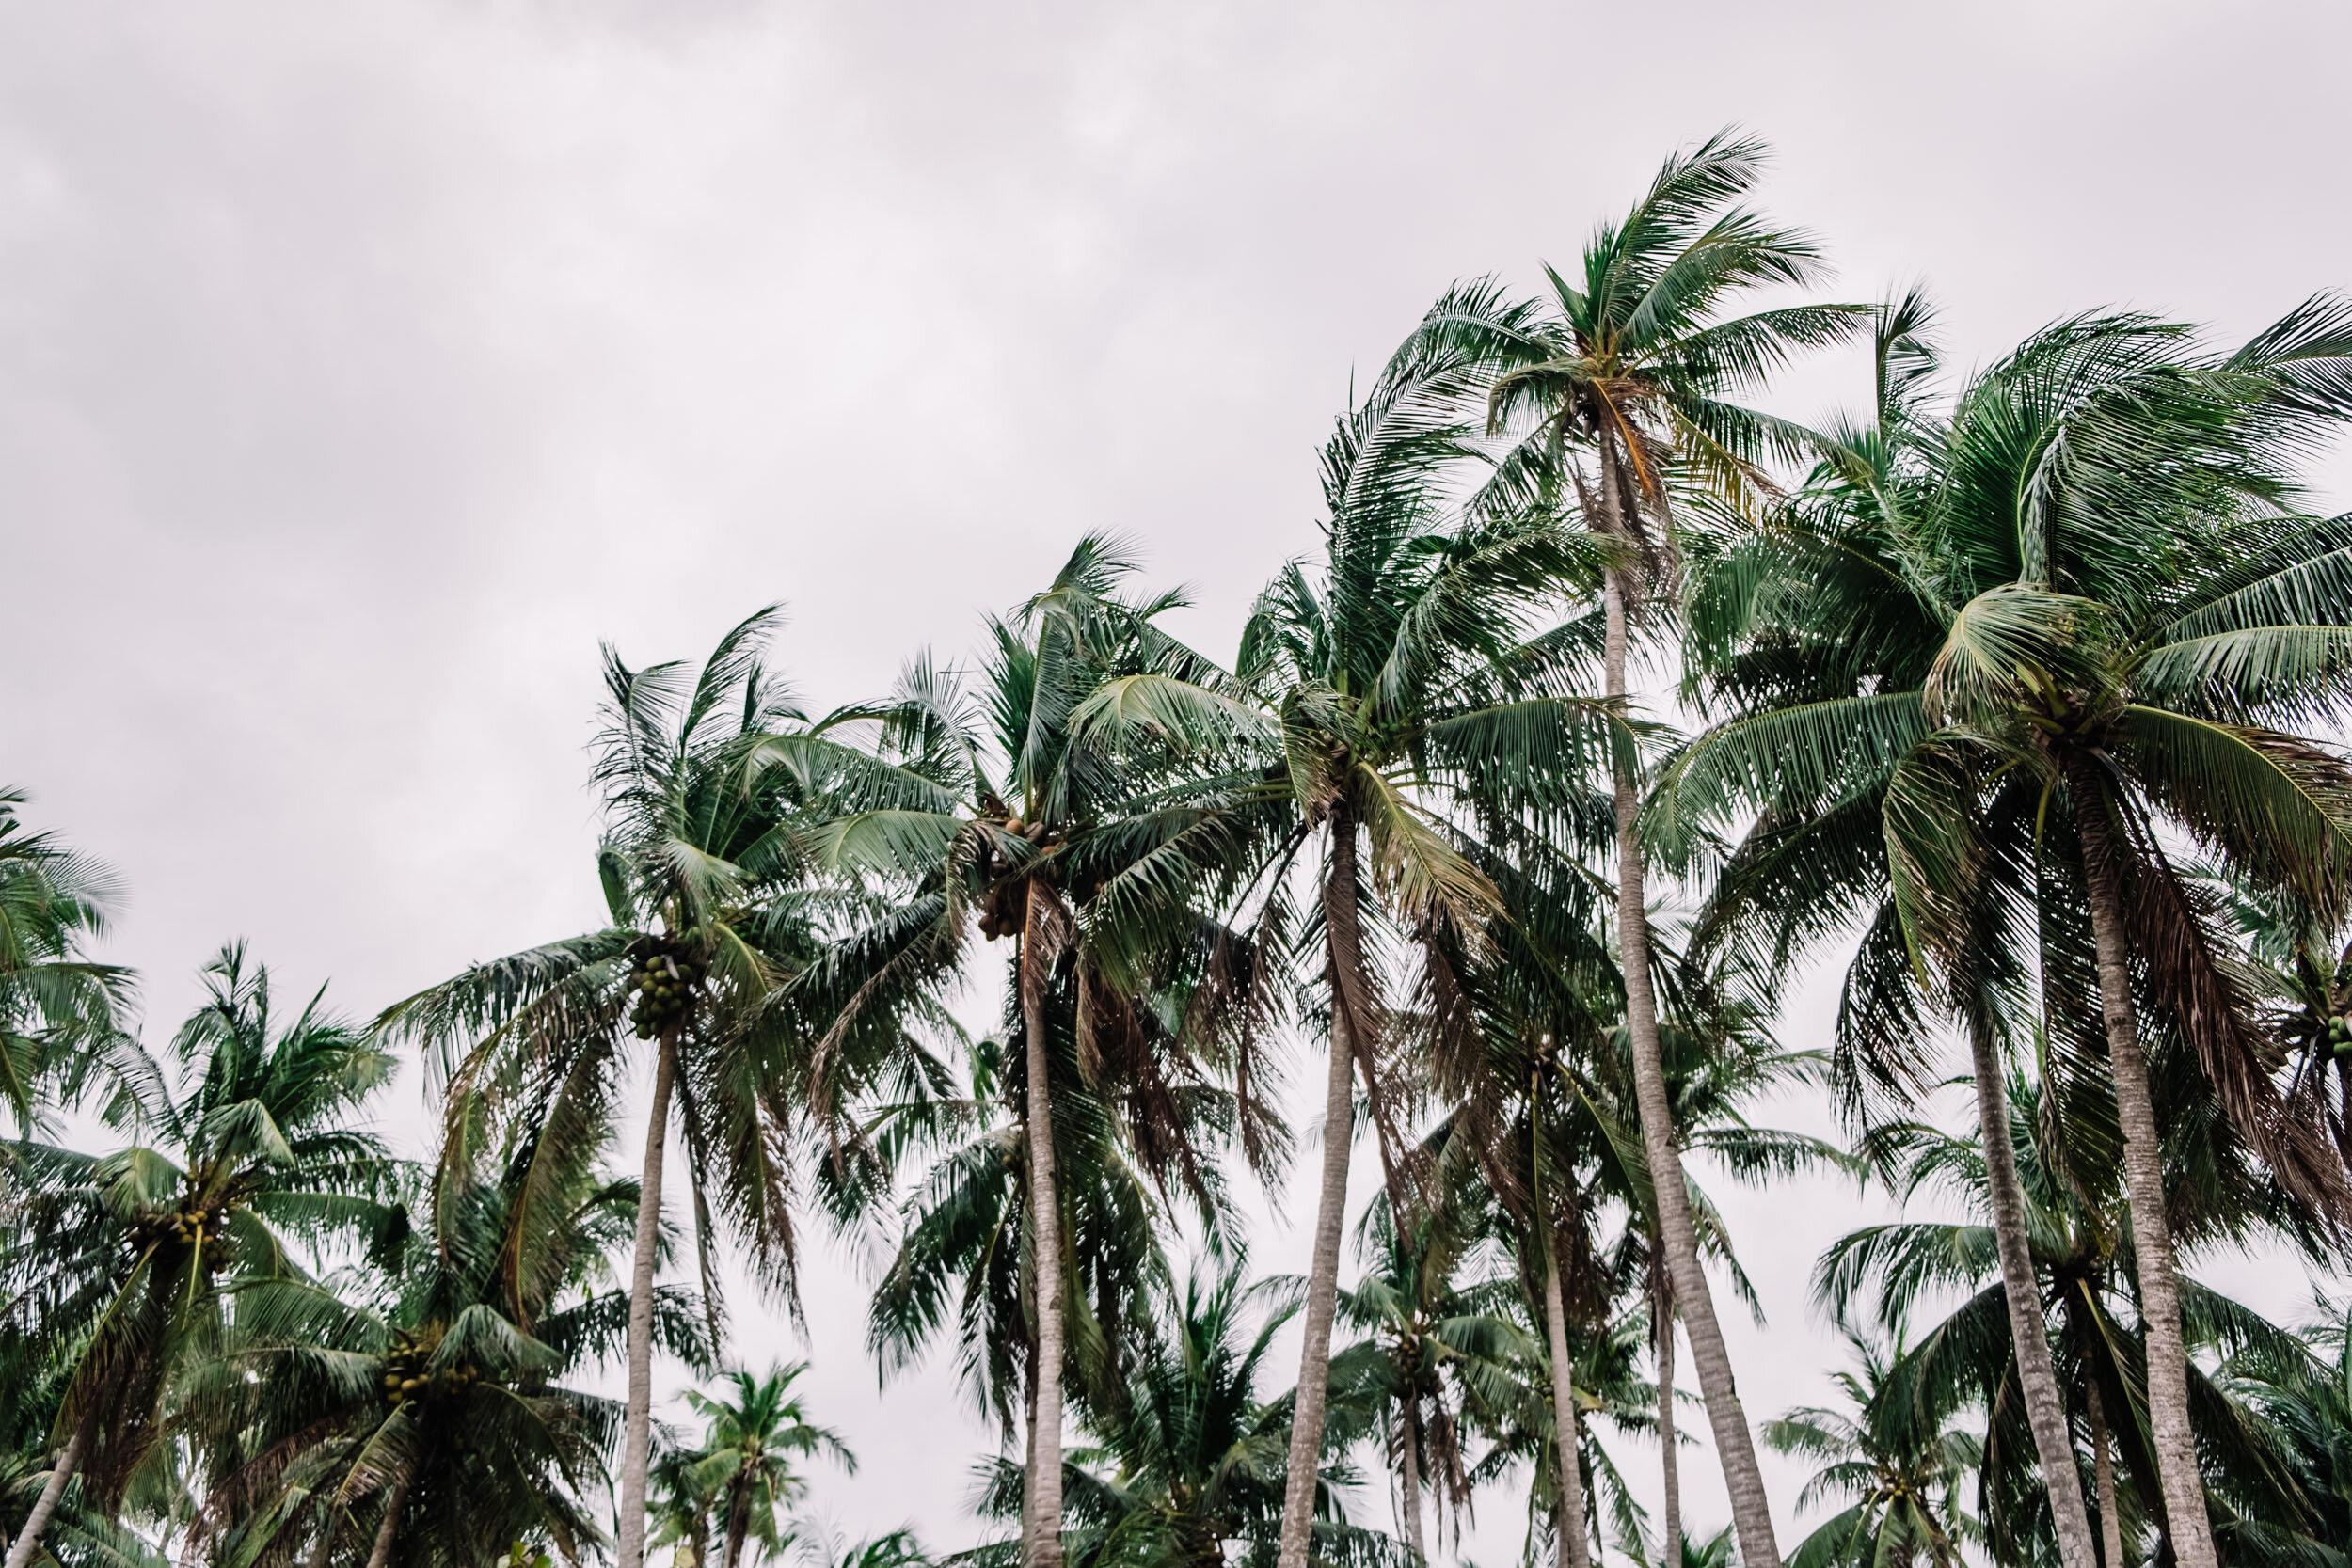 Rachel Off Duty: Coconut Trees on a Cloudy Day